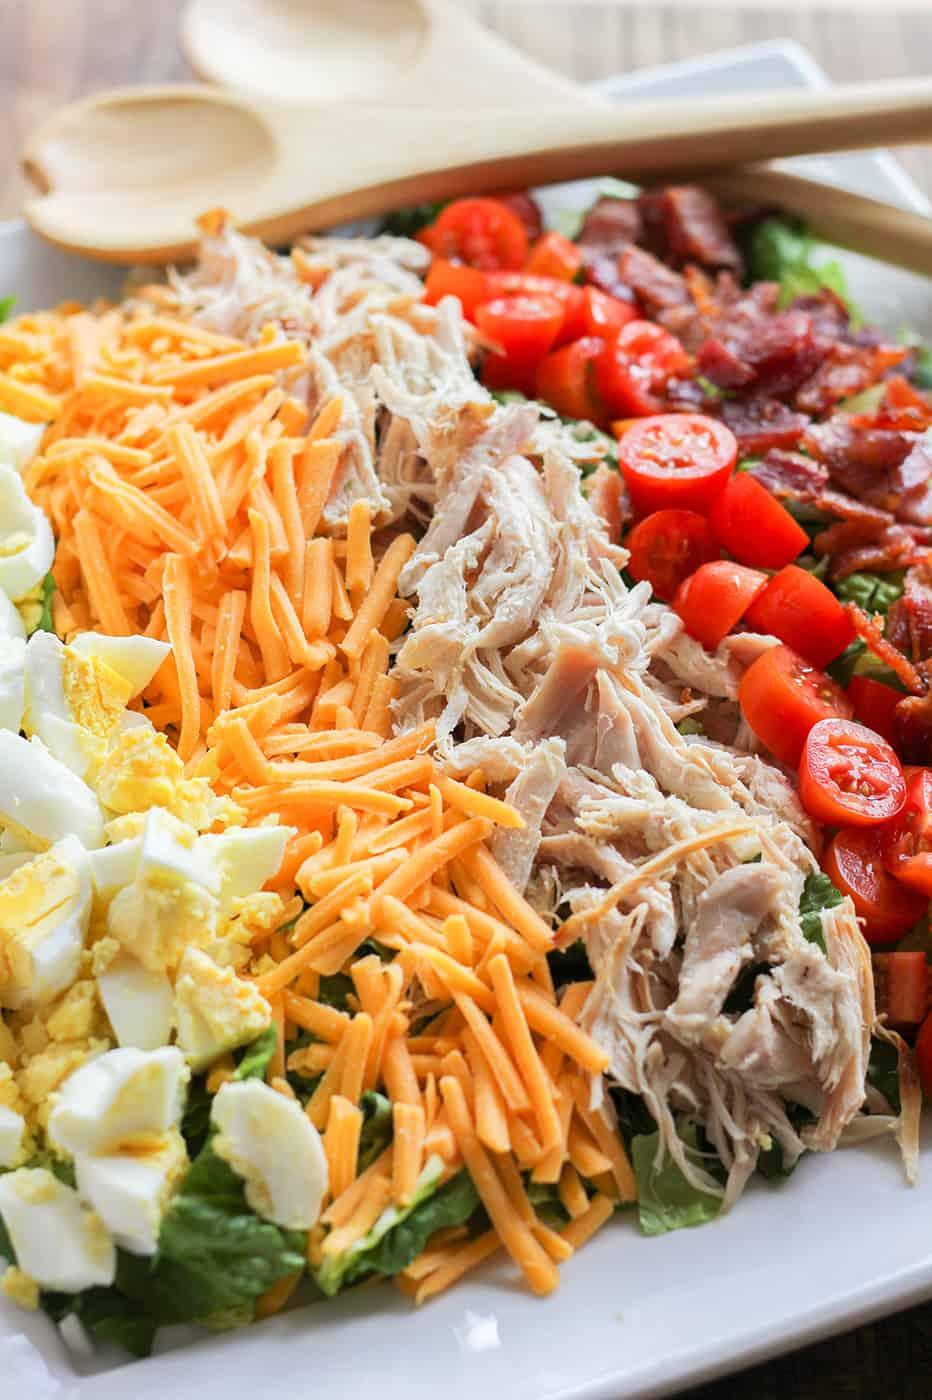 Tasty Chopped Cobb Salad